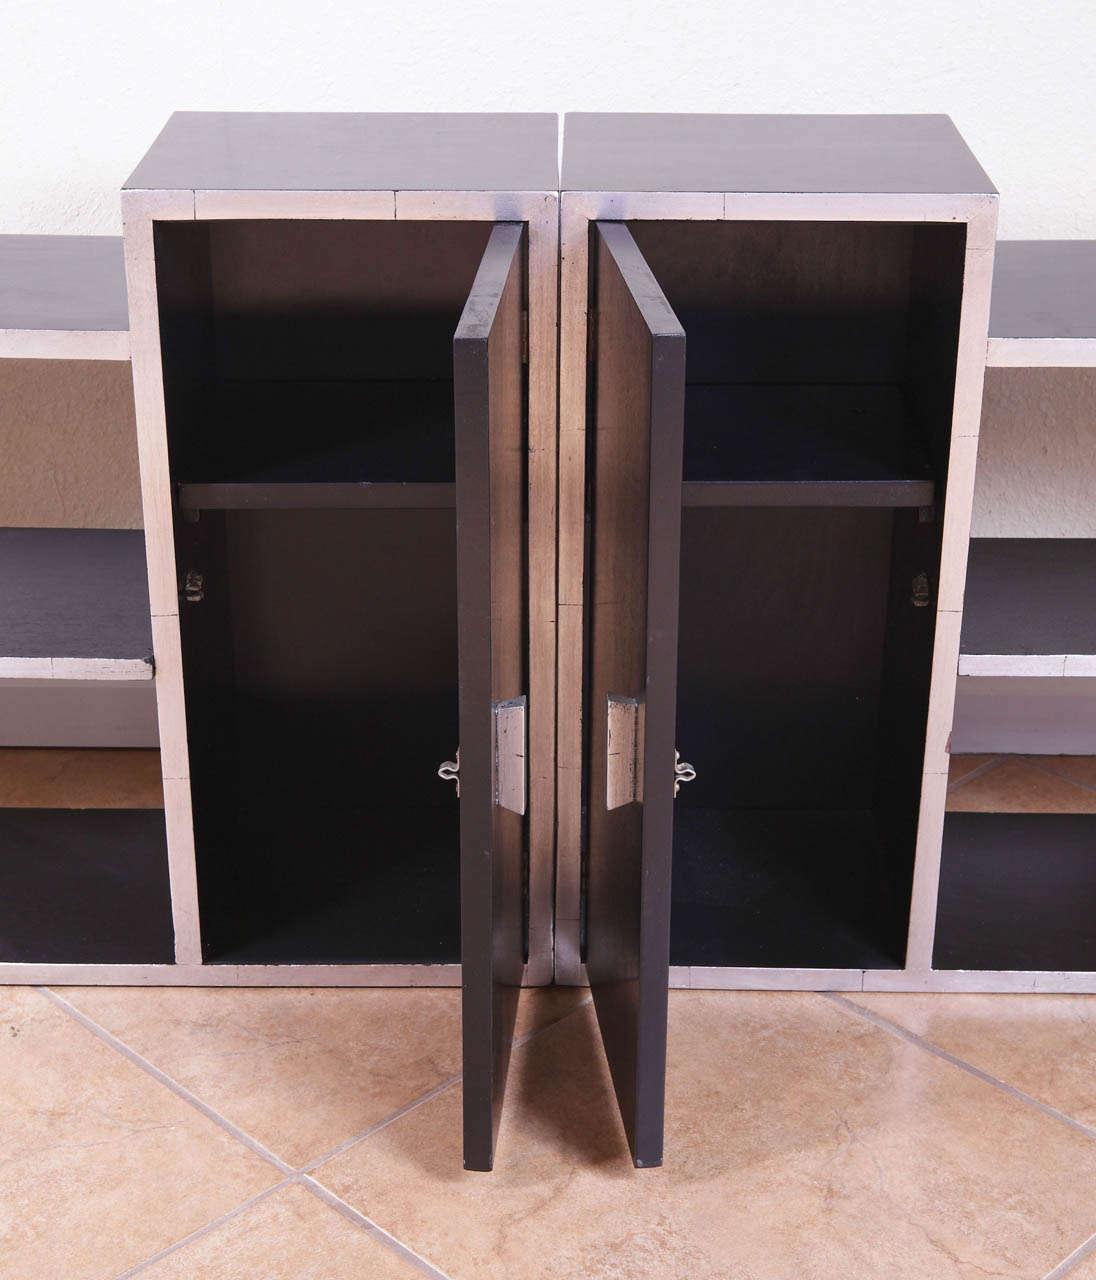 Machine Age Art Deco Paul Frankl / Frankl Galleries Signed Skyscraper Tables In Good Condition For Sale In Dallas, TX